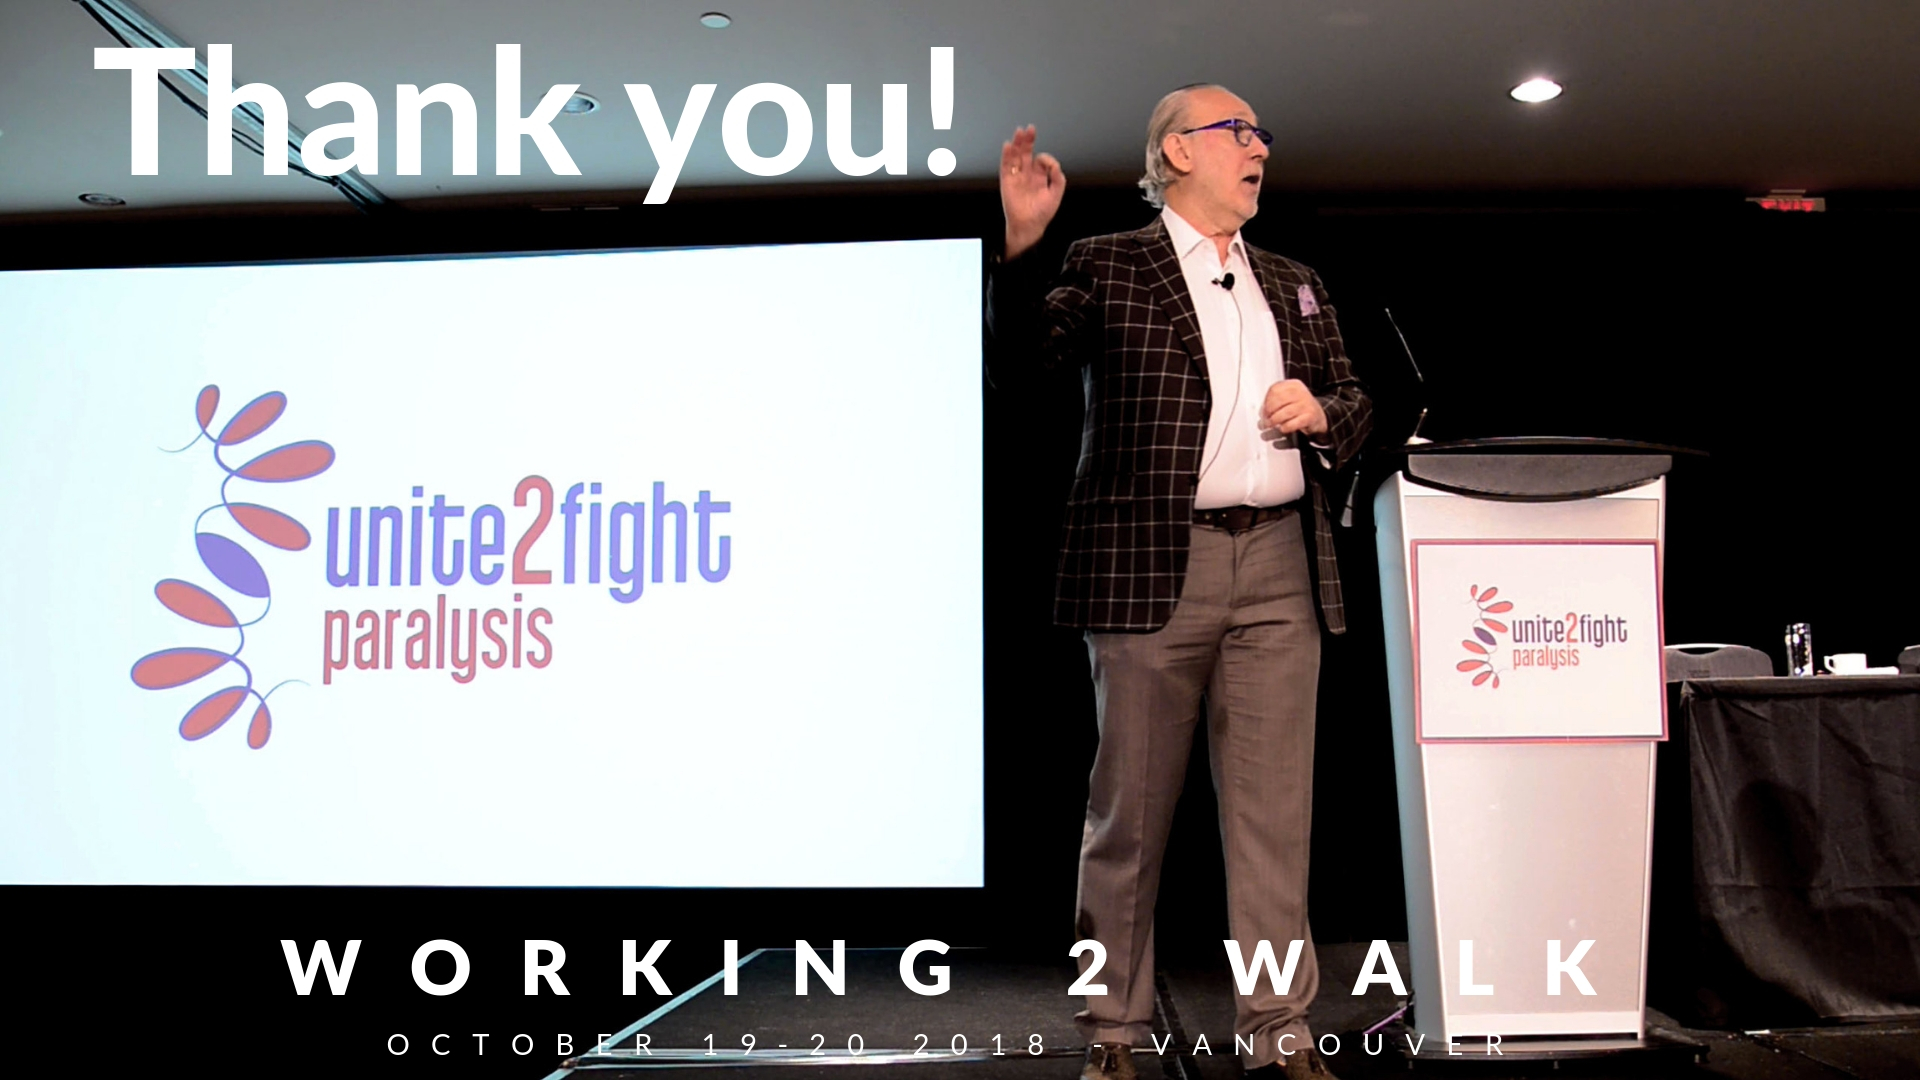 Working 2 Walk 2018 - Thank You!